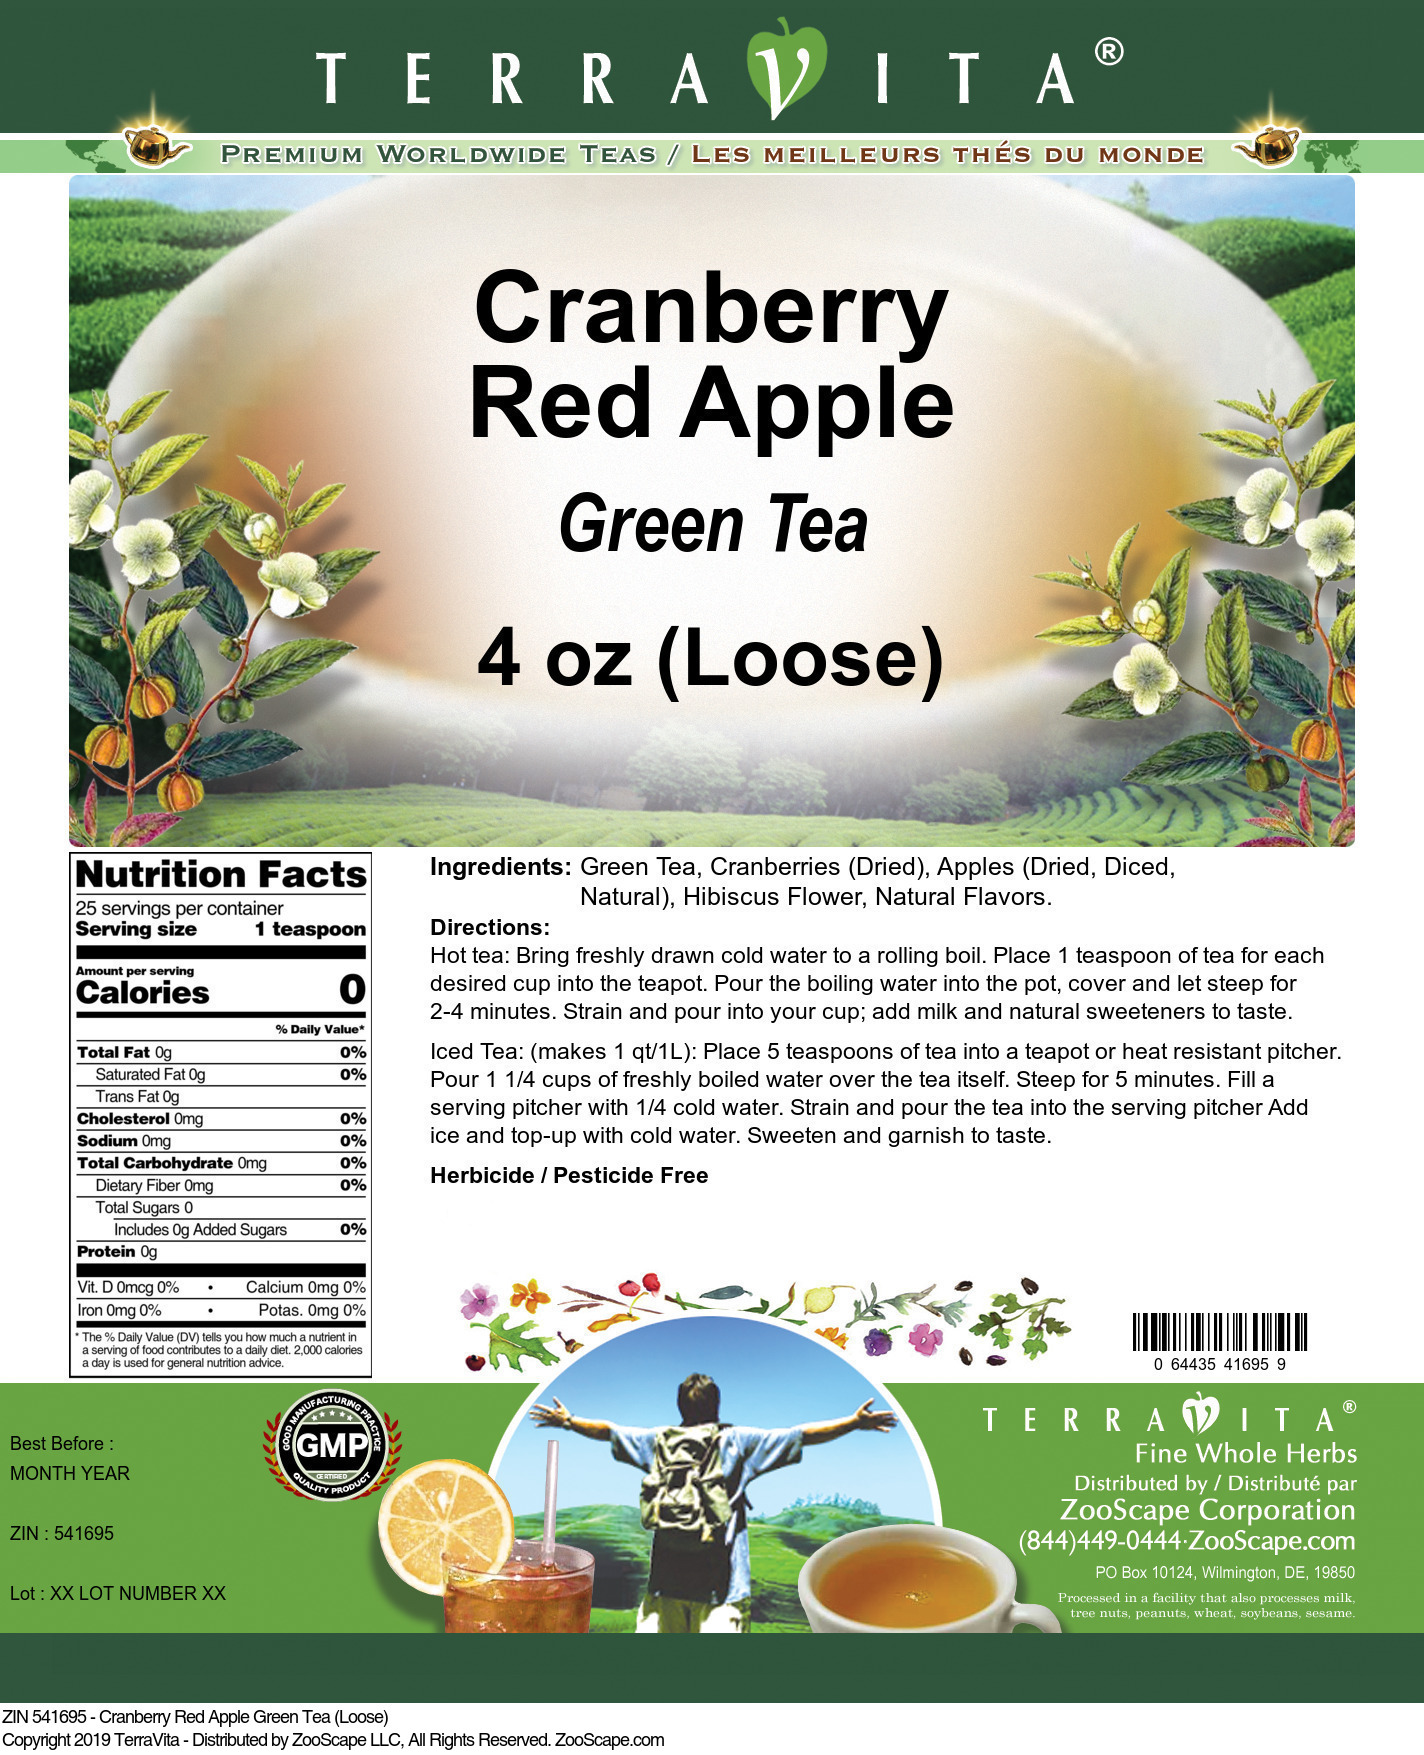 Cranberry Red Apple Green Tea